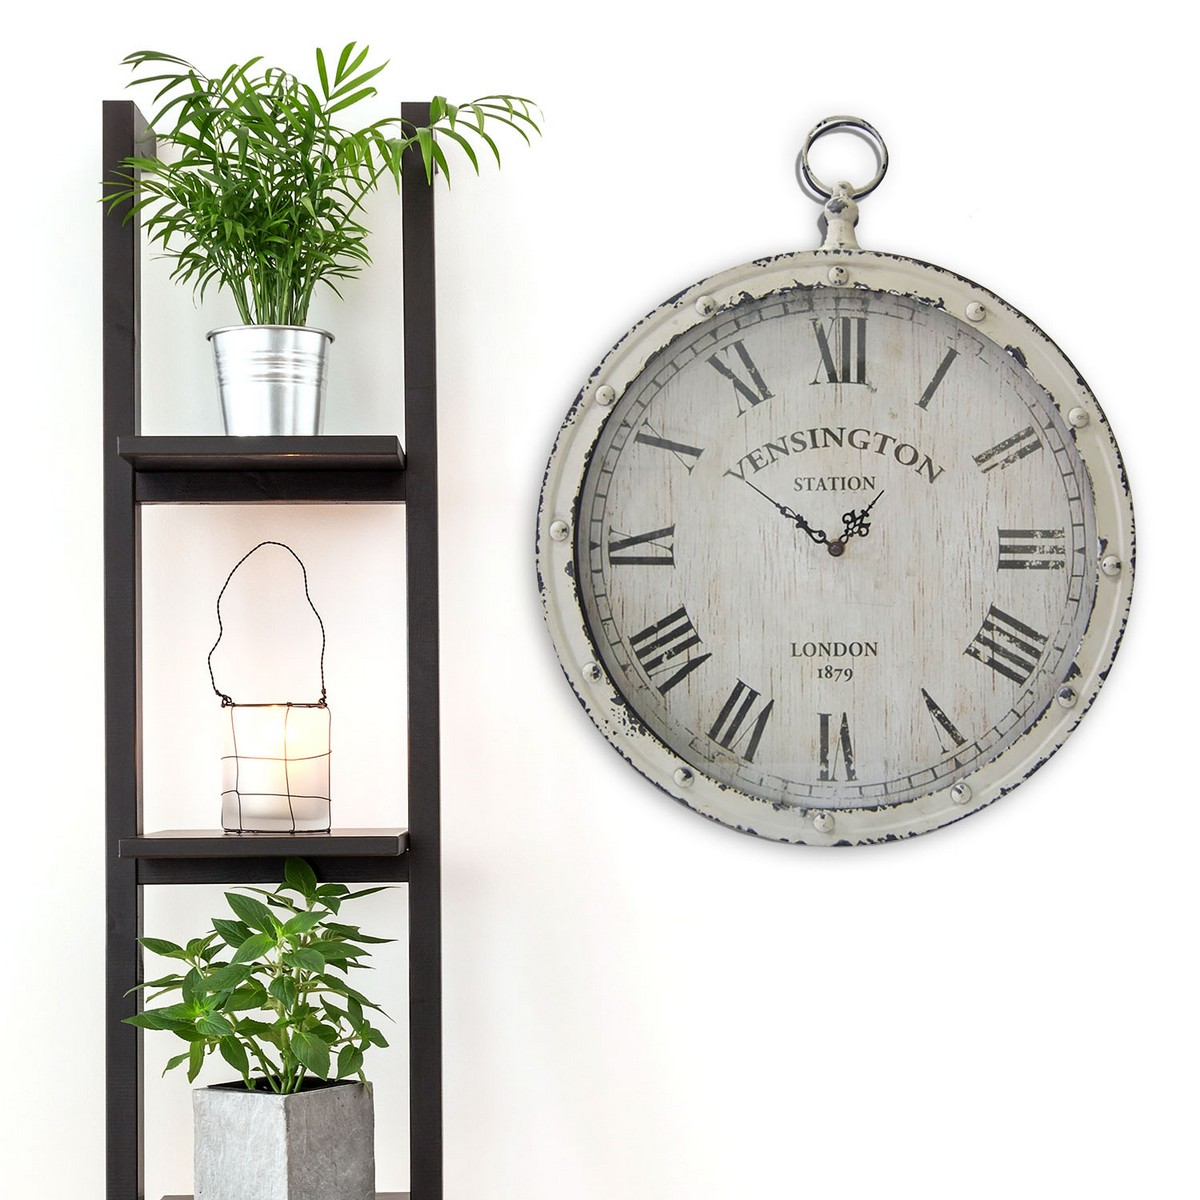 Stratton Home Decor Rustic Medallion Wall Art White ~ Stratton home decor pocket watch wall clock white